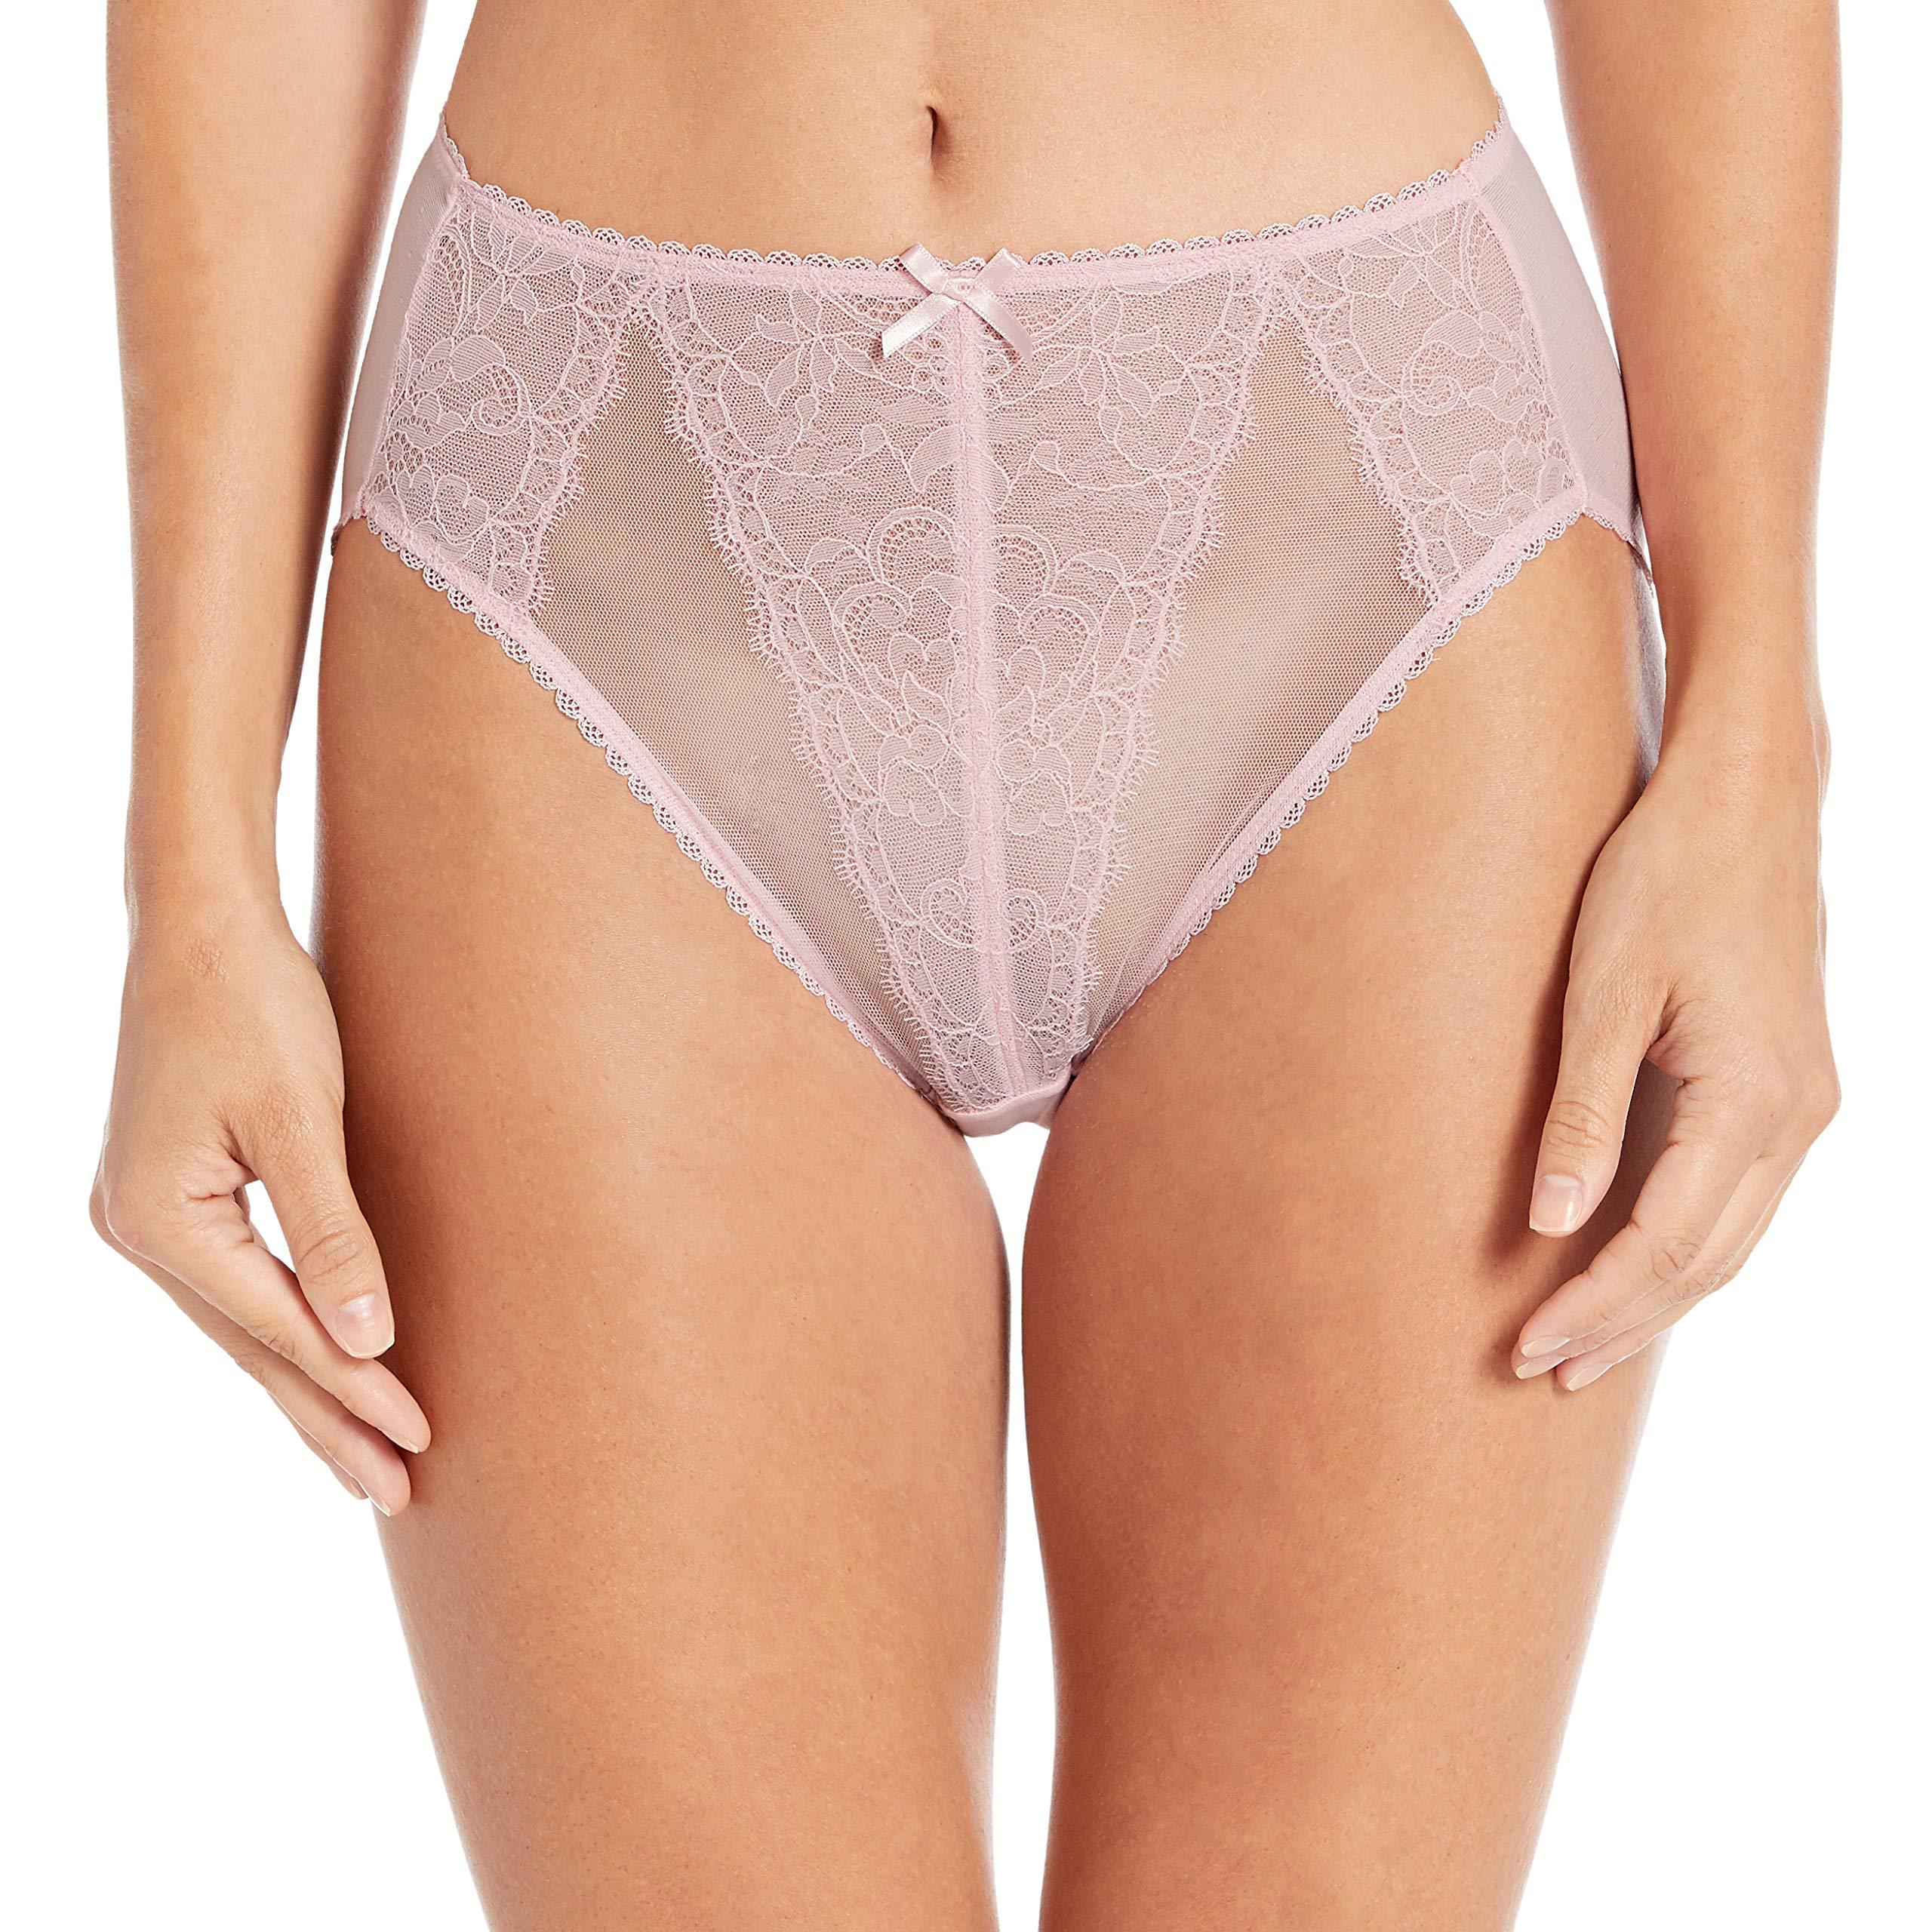 Wacoal 841186 Retro Chic Hi-Cut Panty Very Violet MED LARGE XL Free Shipping